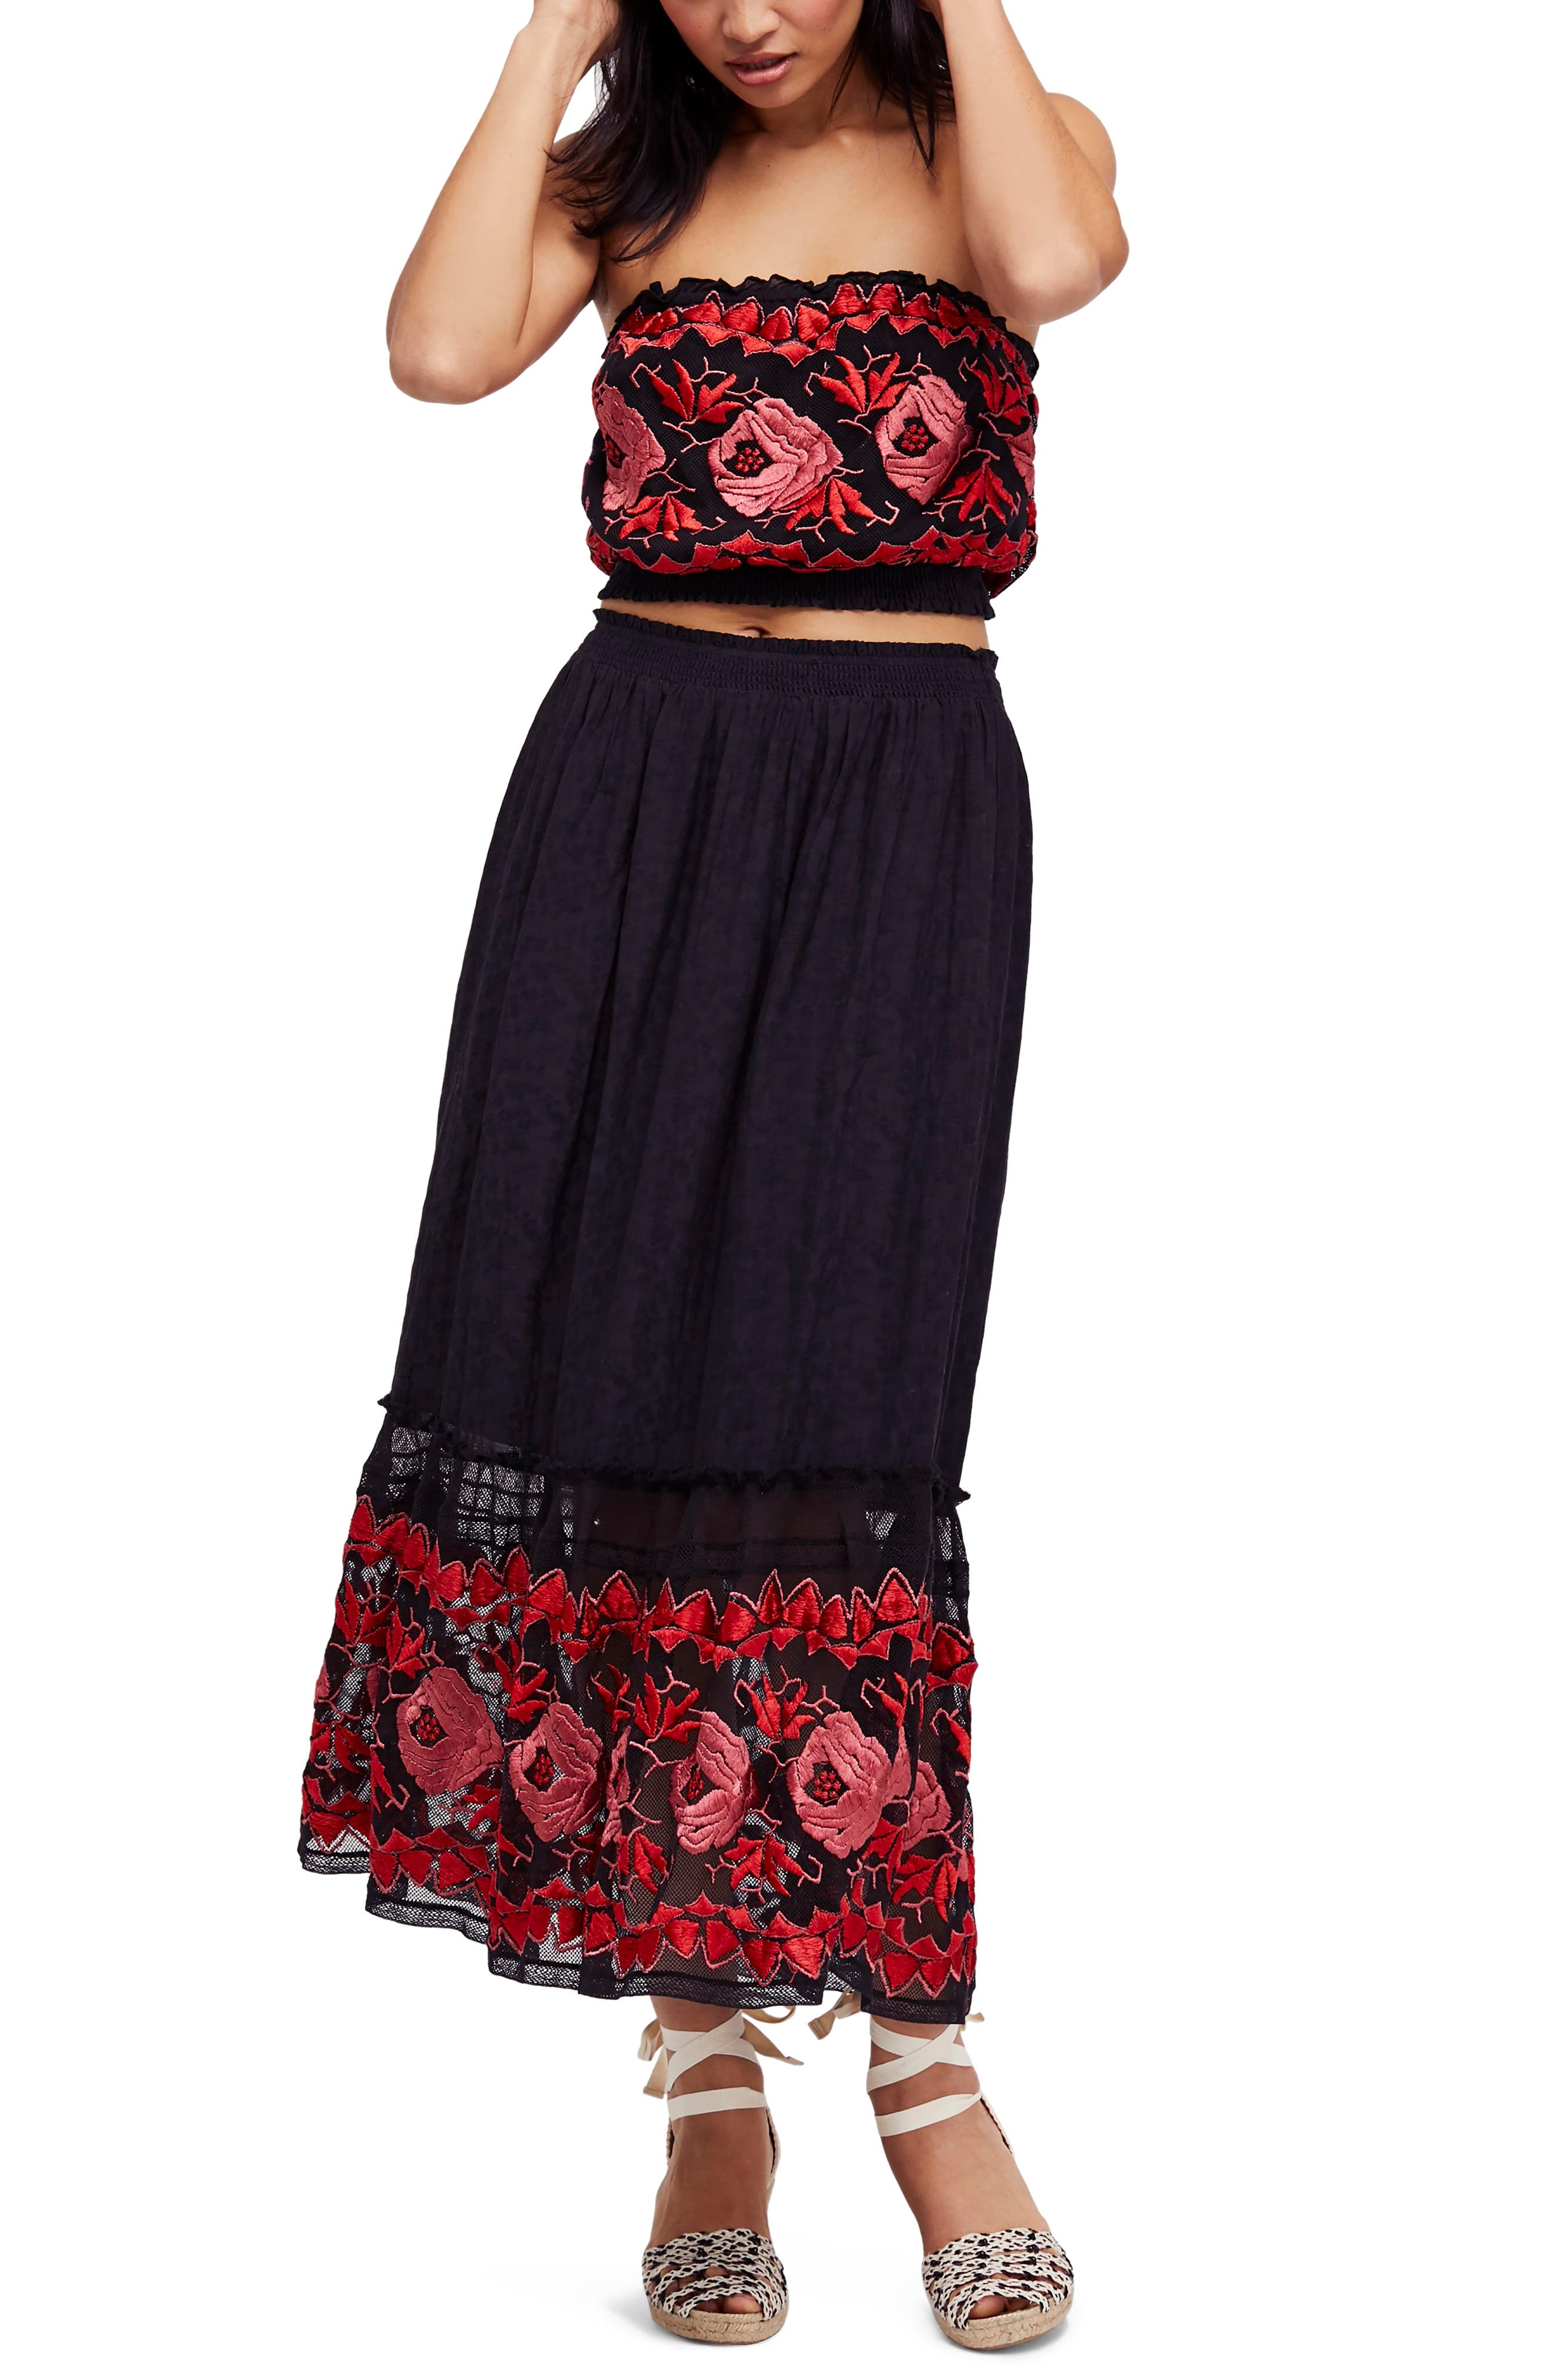 Rosebud Top & Skirt,                         Main,                         color, Black Combo